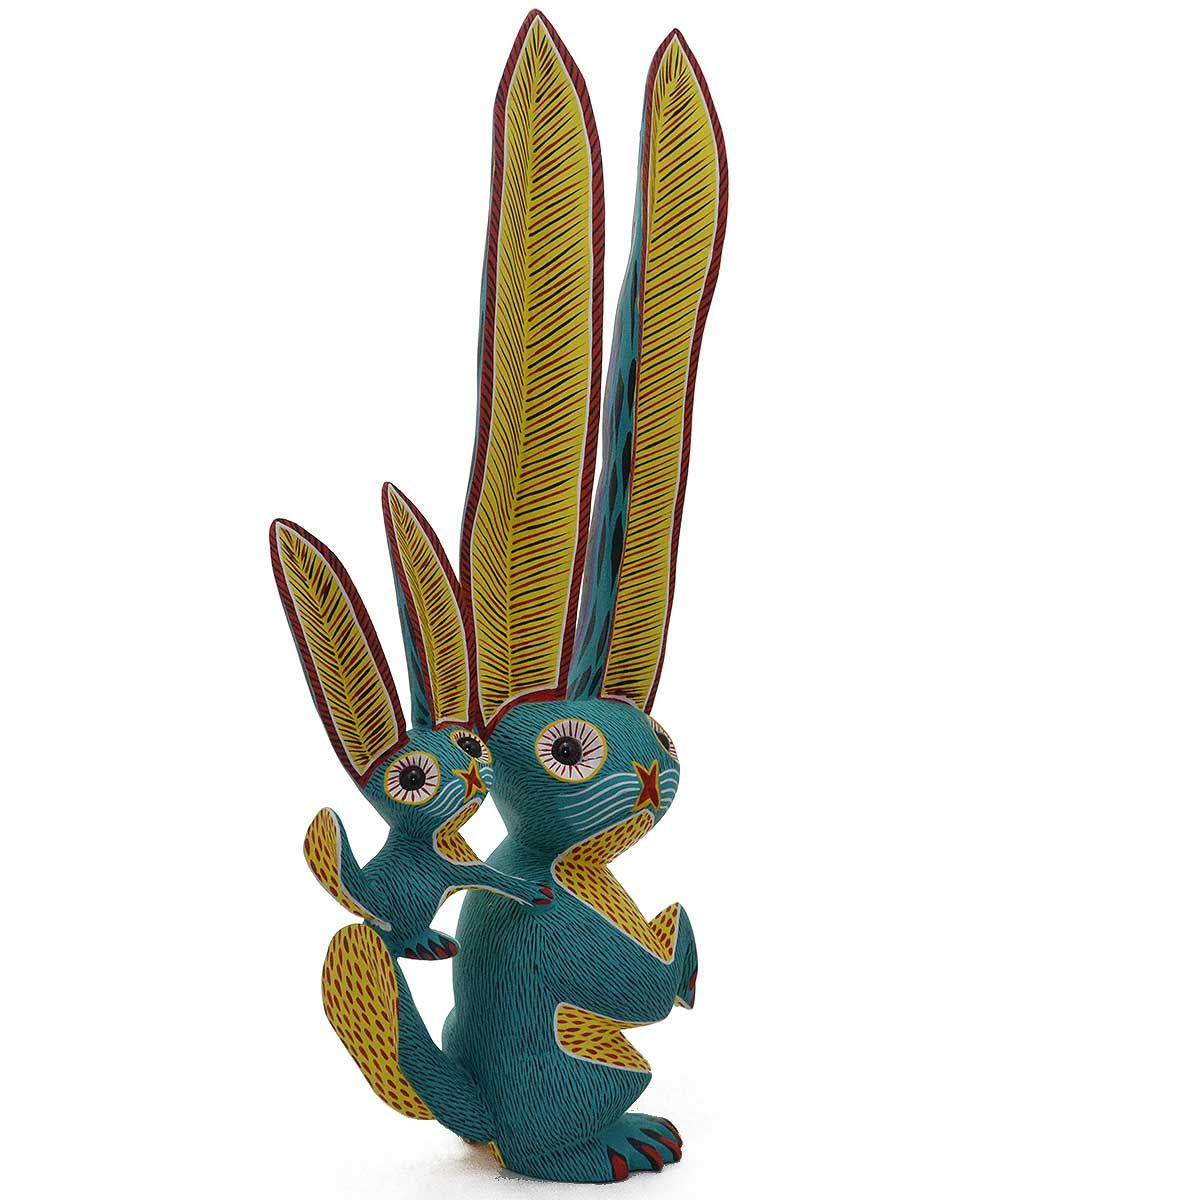 Arsenio morales very large green rabbit and baby alebrijes